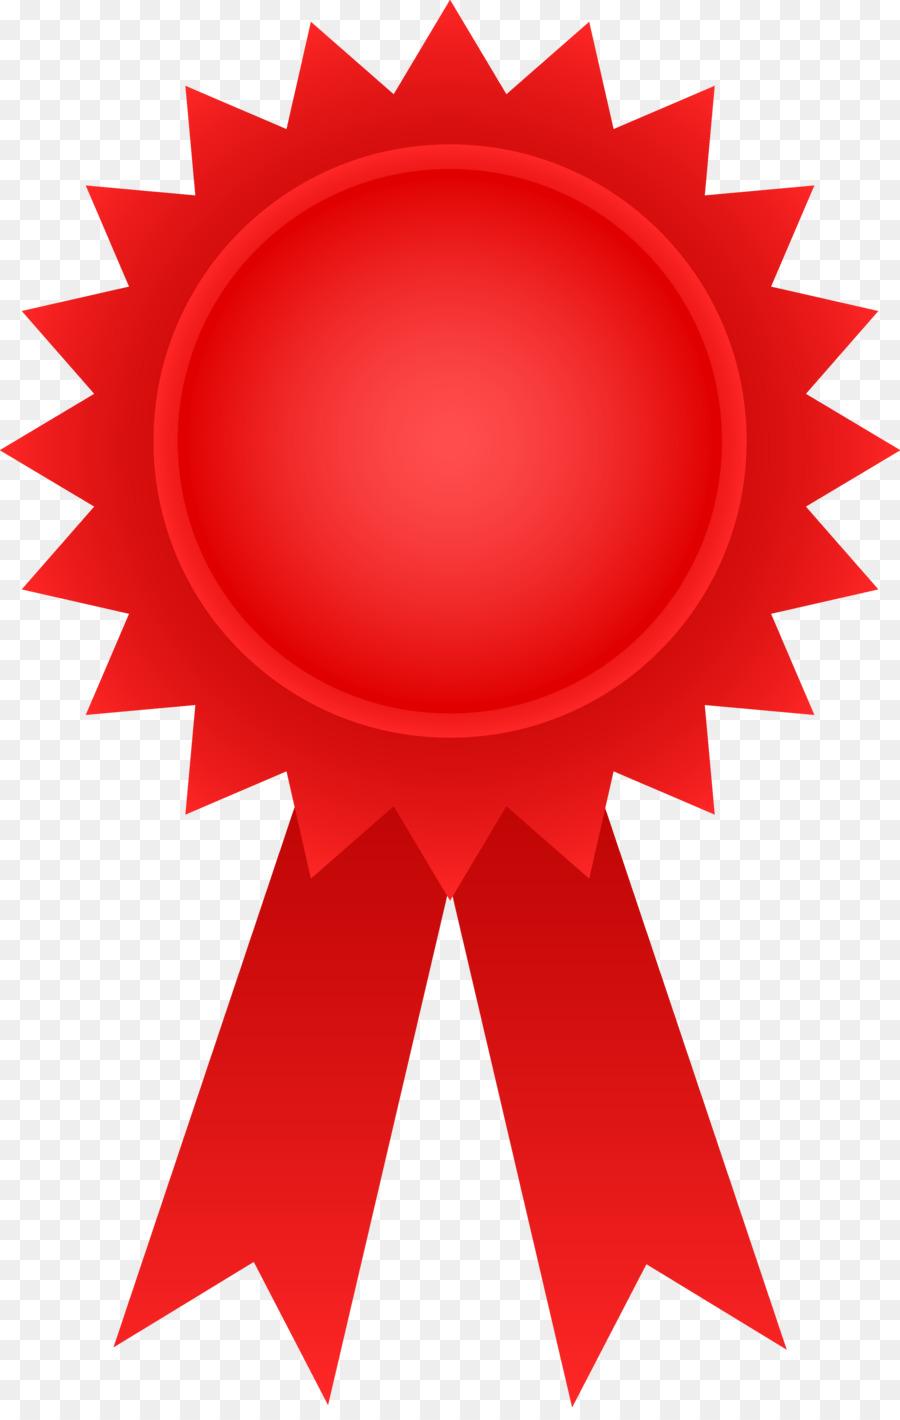 Award clipart ribbon clip art. Red background circle